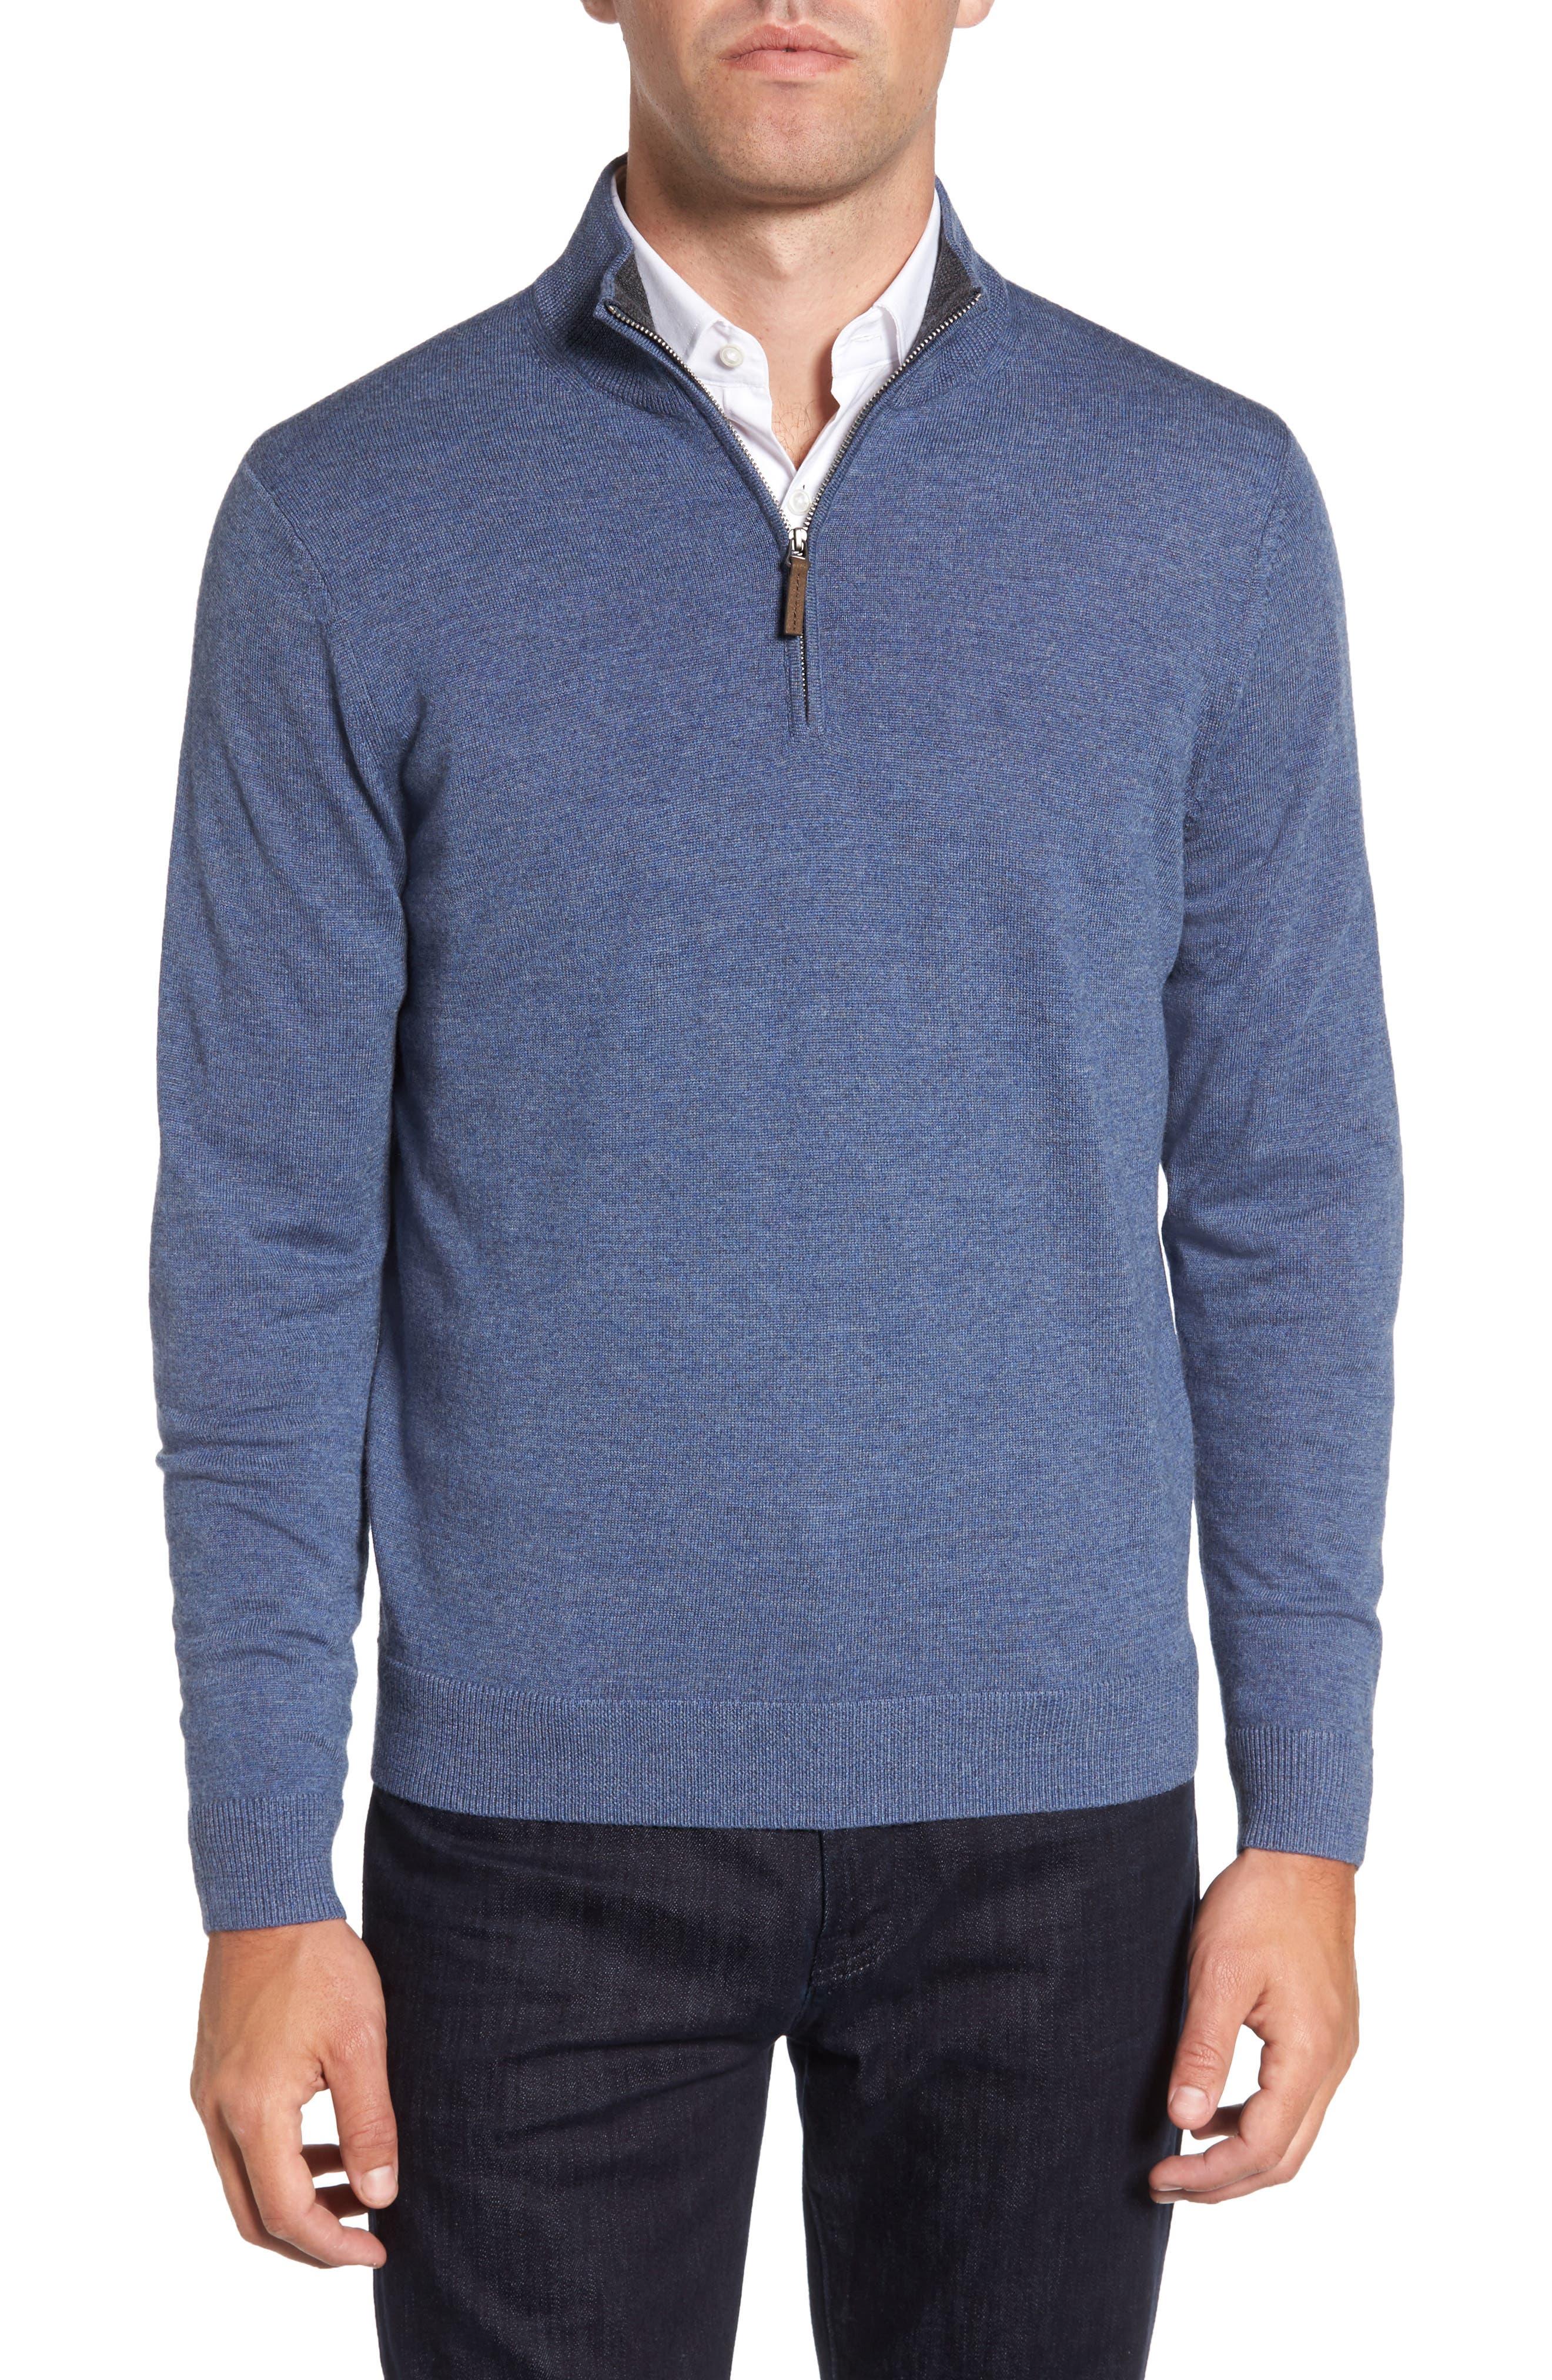 Main Image - Nordstrom Men's Shop Quarter Zip Merino Wool Pullover